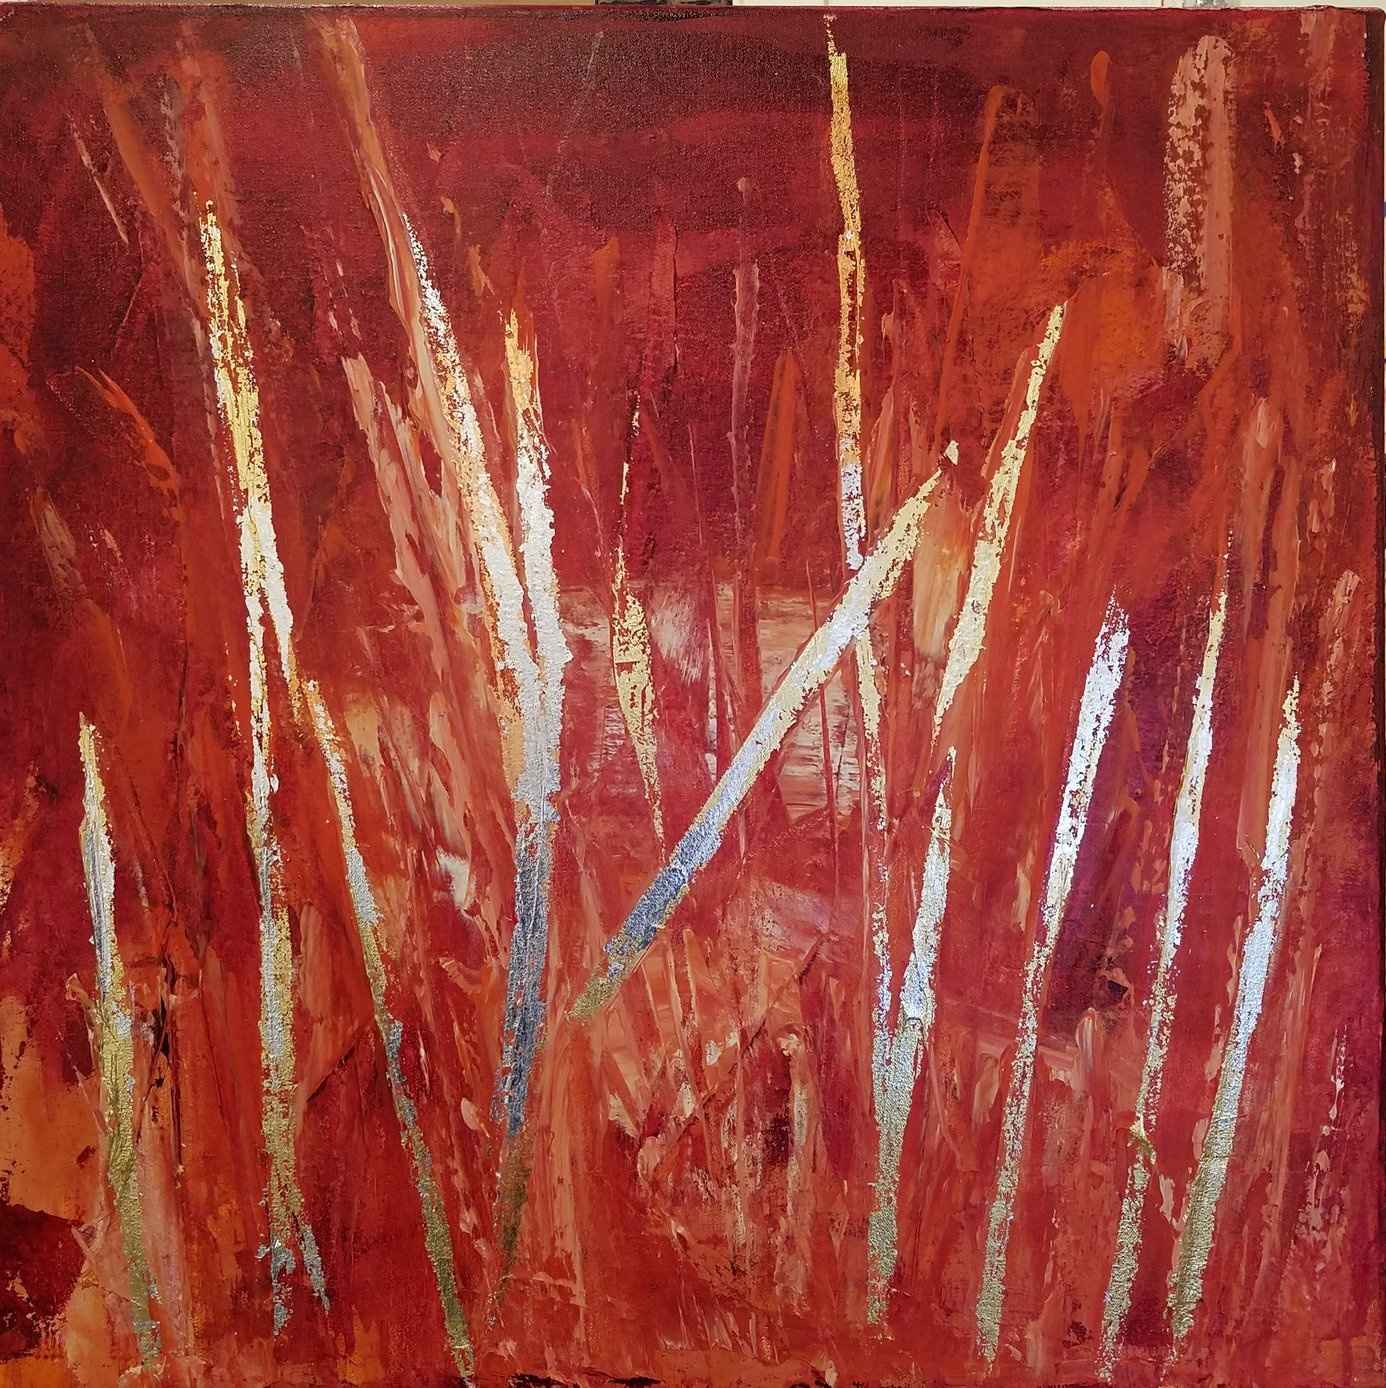 Heat of Summer by  Steve Lyons - Masterpiece Online